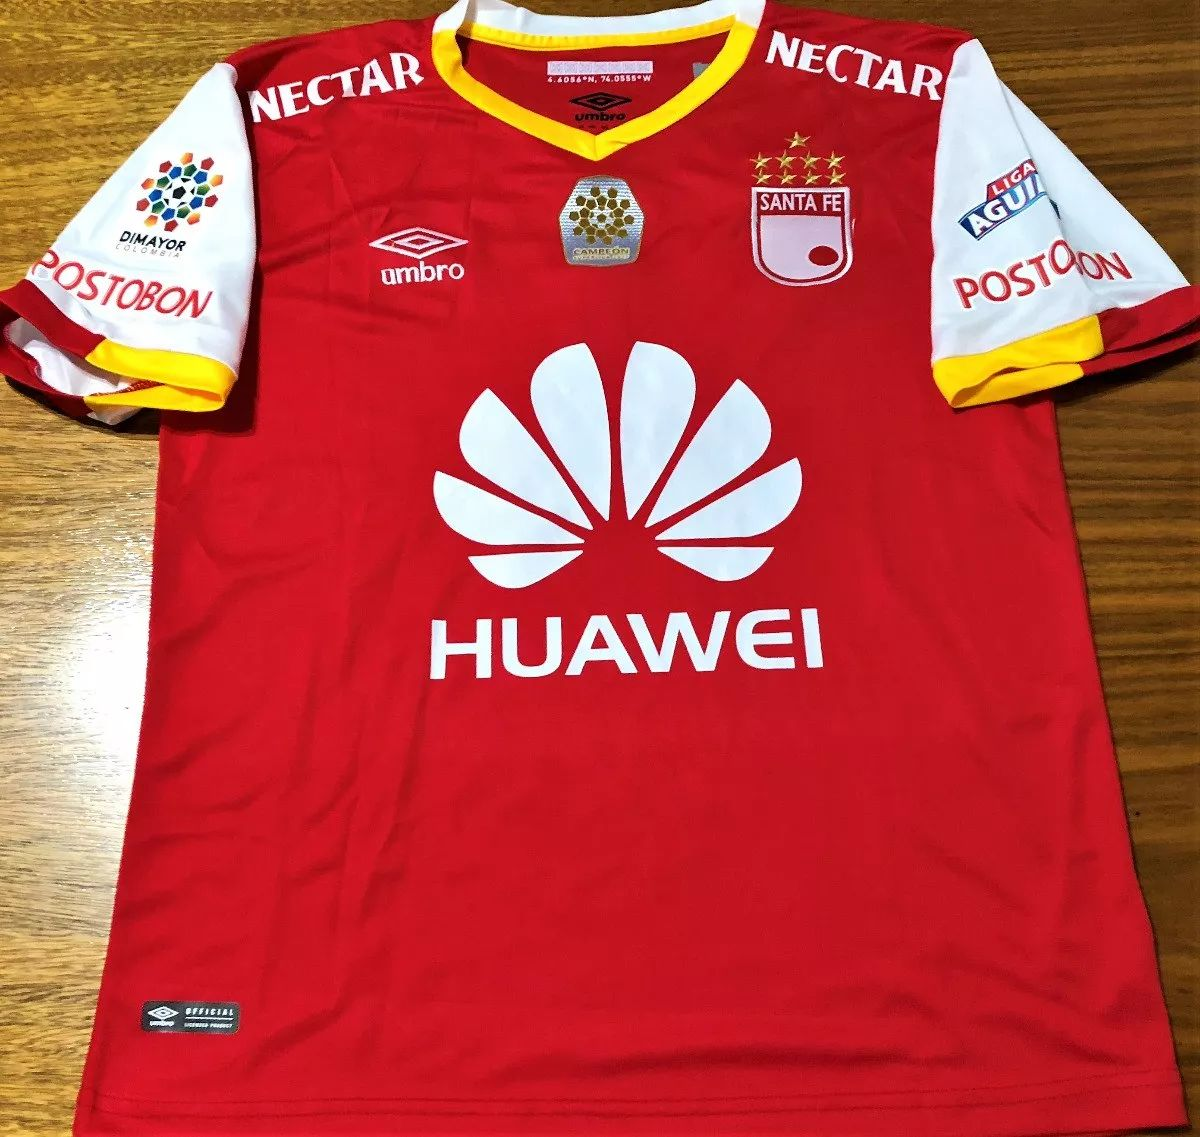 66559de69 Independiente Santa Fe Home camisa de futebol 2017 ...